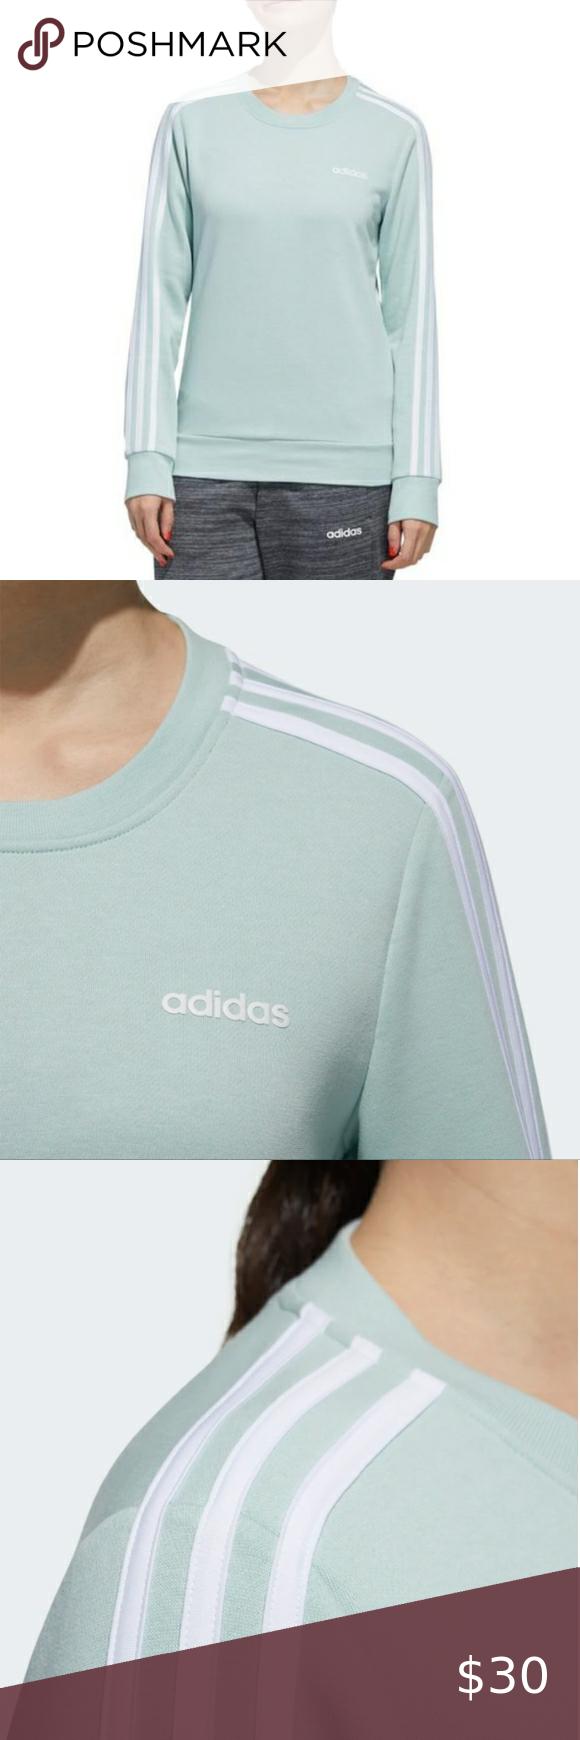 Adidas French Terry 3 Stripes Sweatshirt Small Striped Sweatshirts White Adidas Sweater Cozy Pullover [ 1740 x 580 Pixel ]